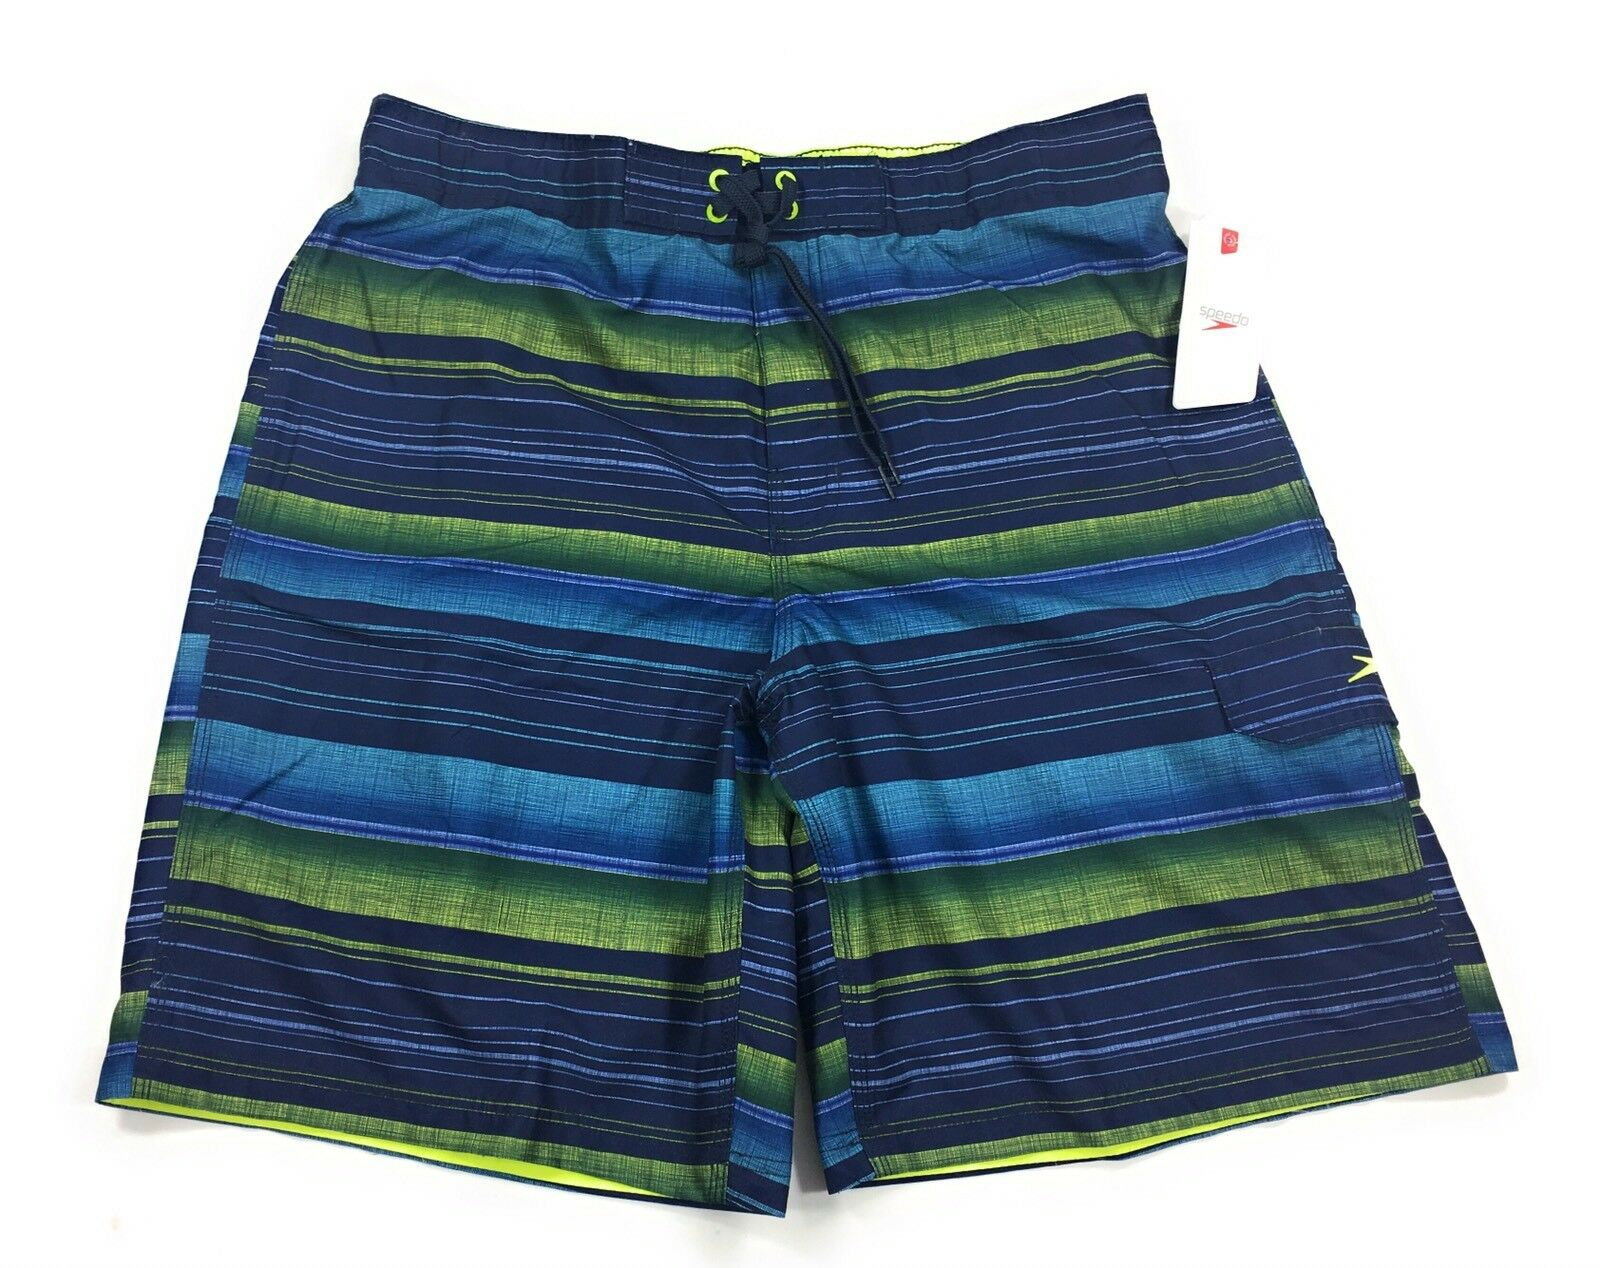 Speedo Board Shorts Mens Swim Suit Trunks Navy Stripe